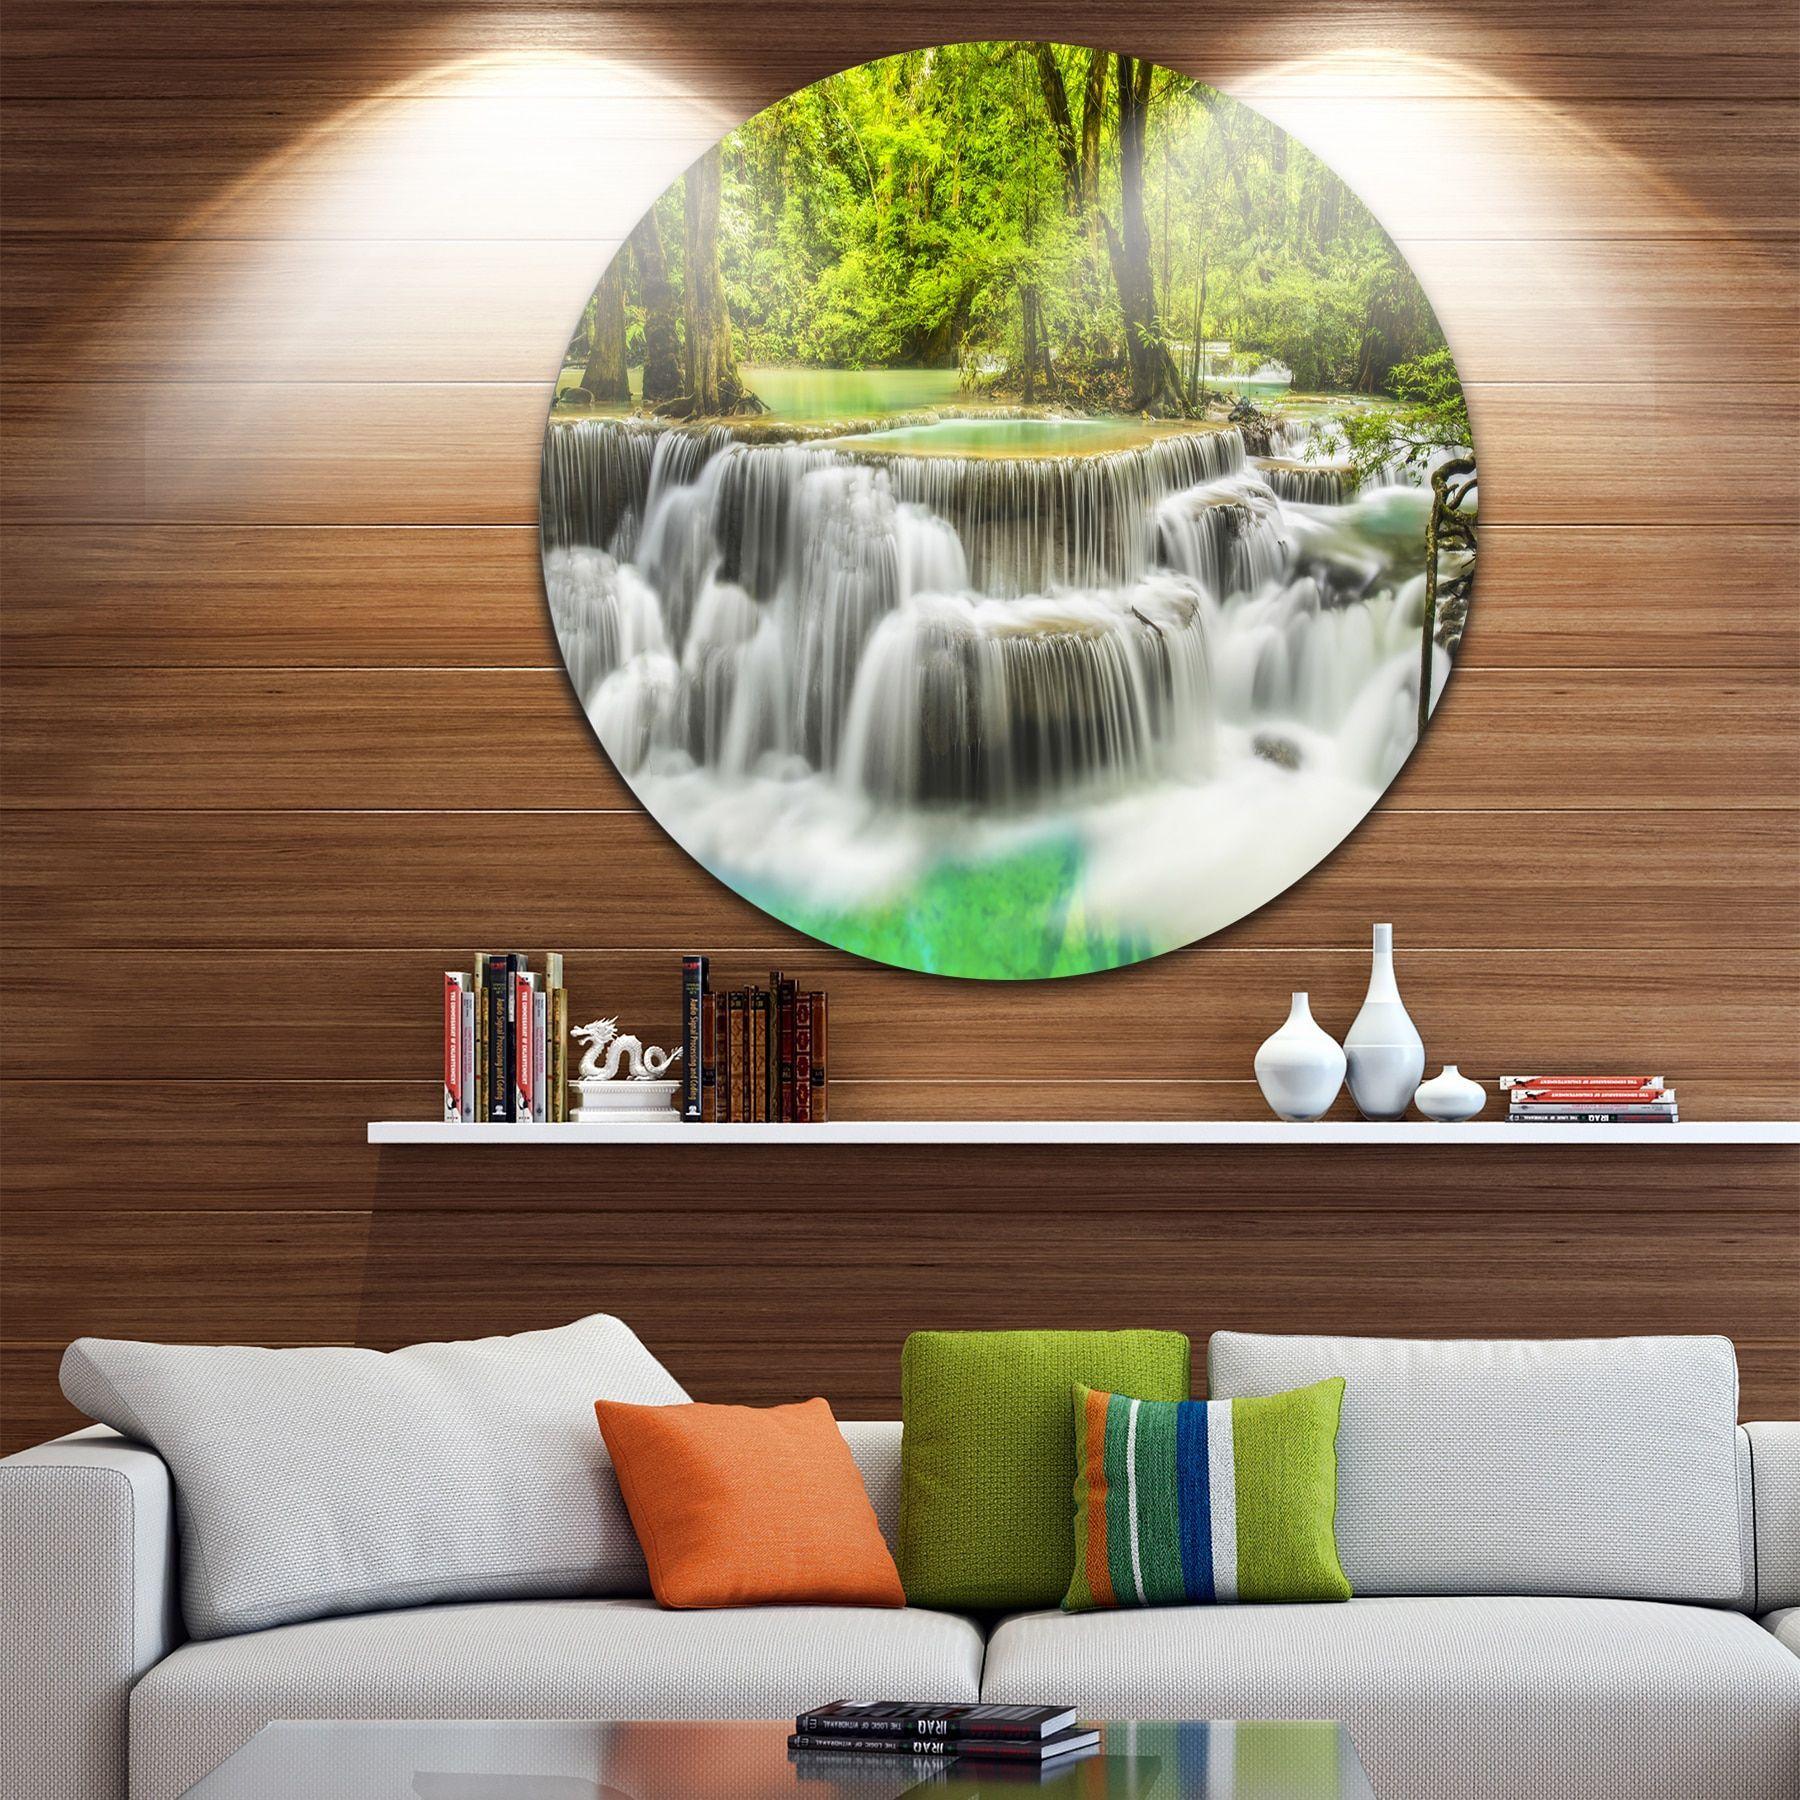 Designart uerawan waterfall viewu photography disc metal wall art